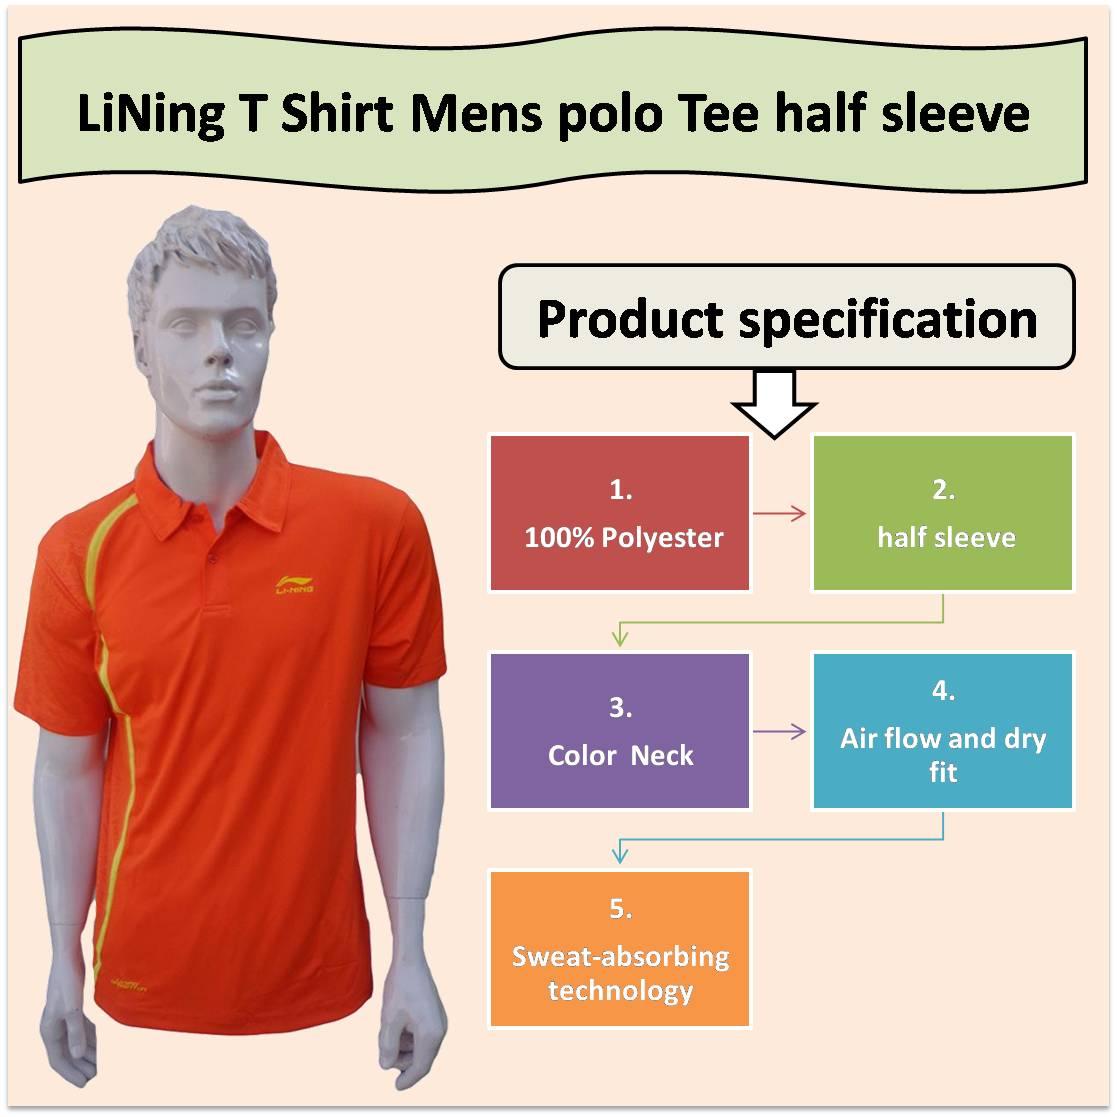 LiNing T Shirt Mens polo Tee half sleeve Orange